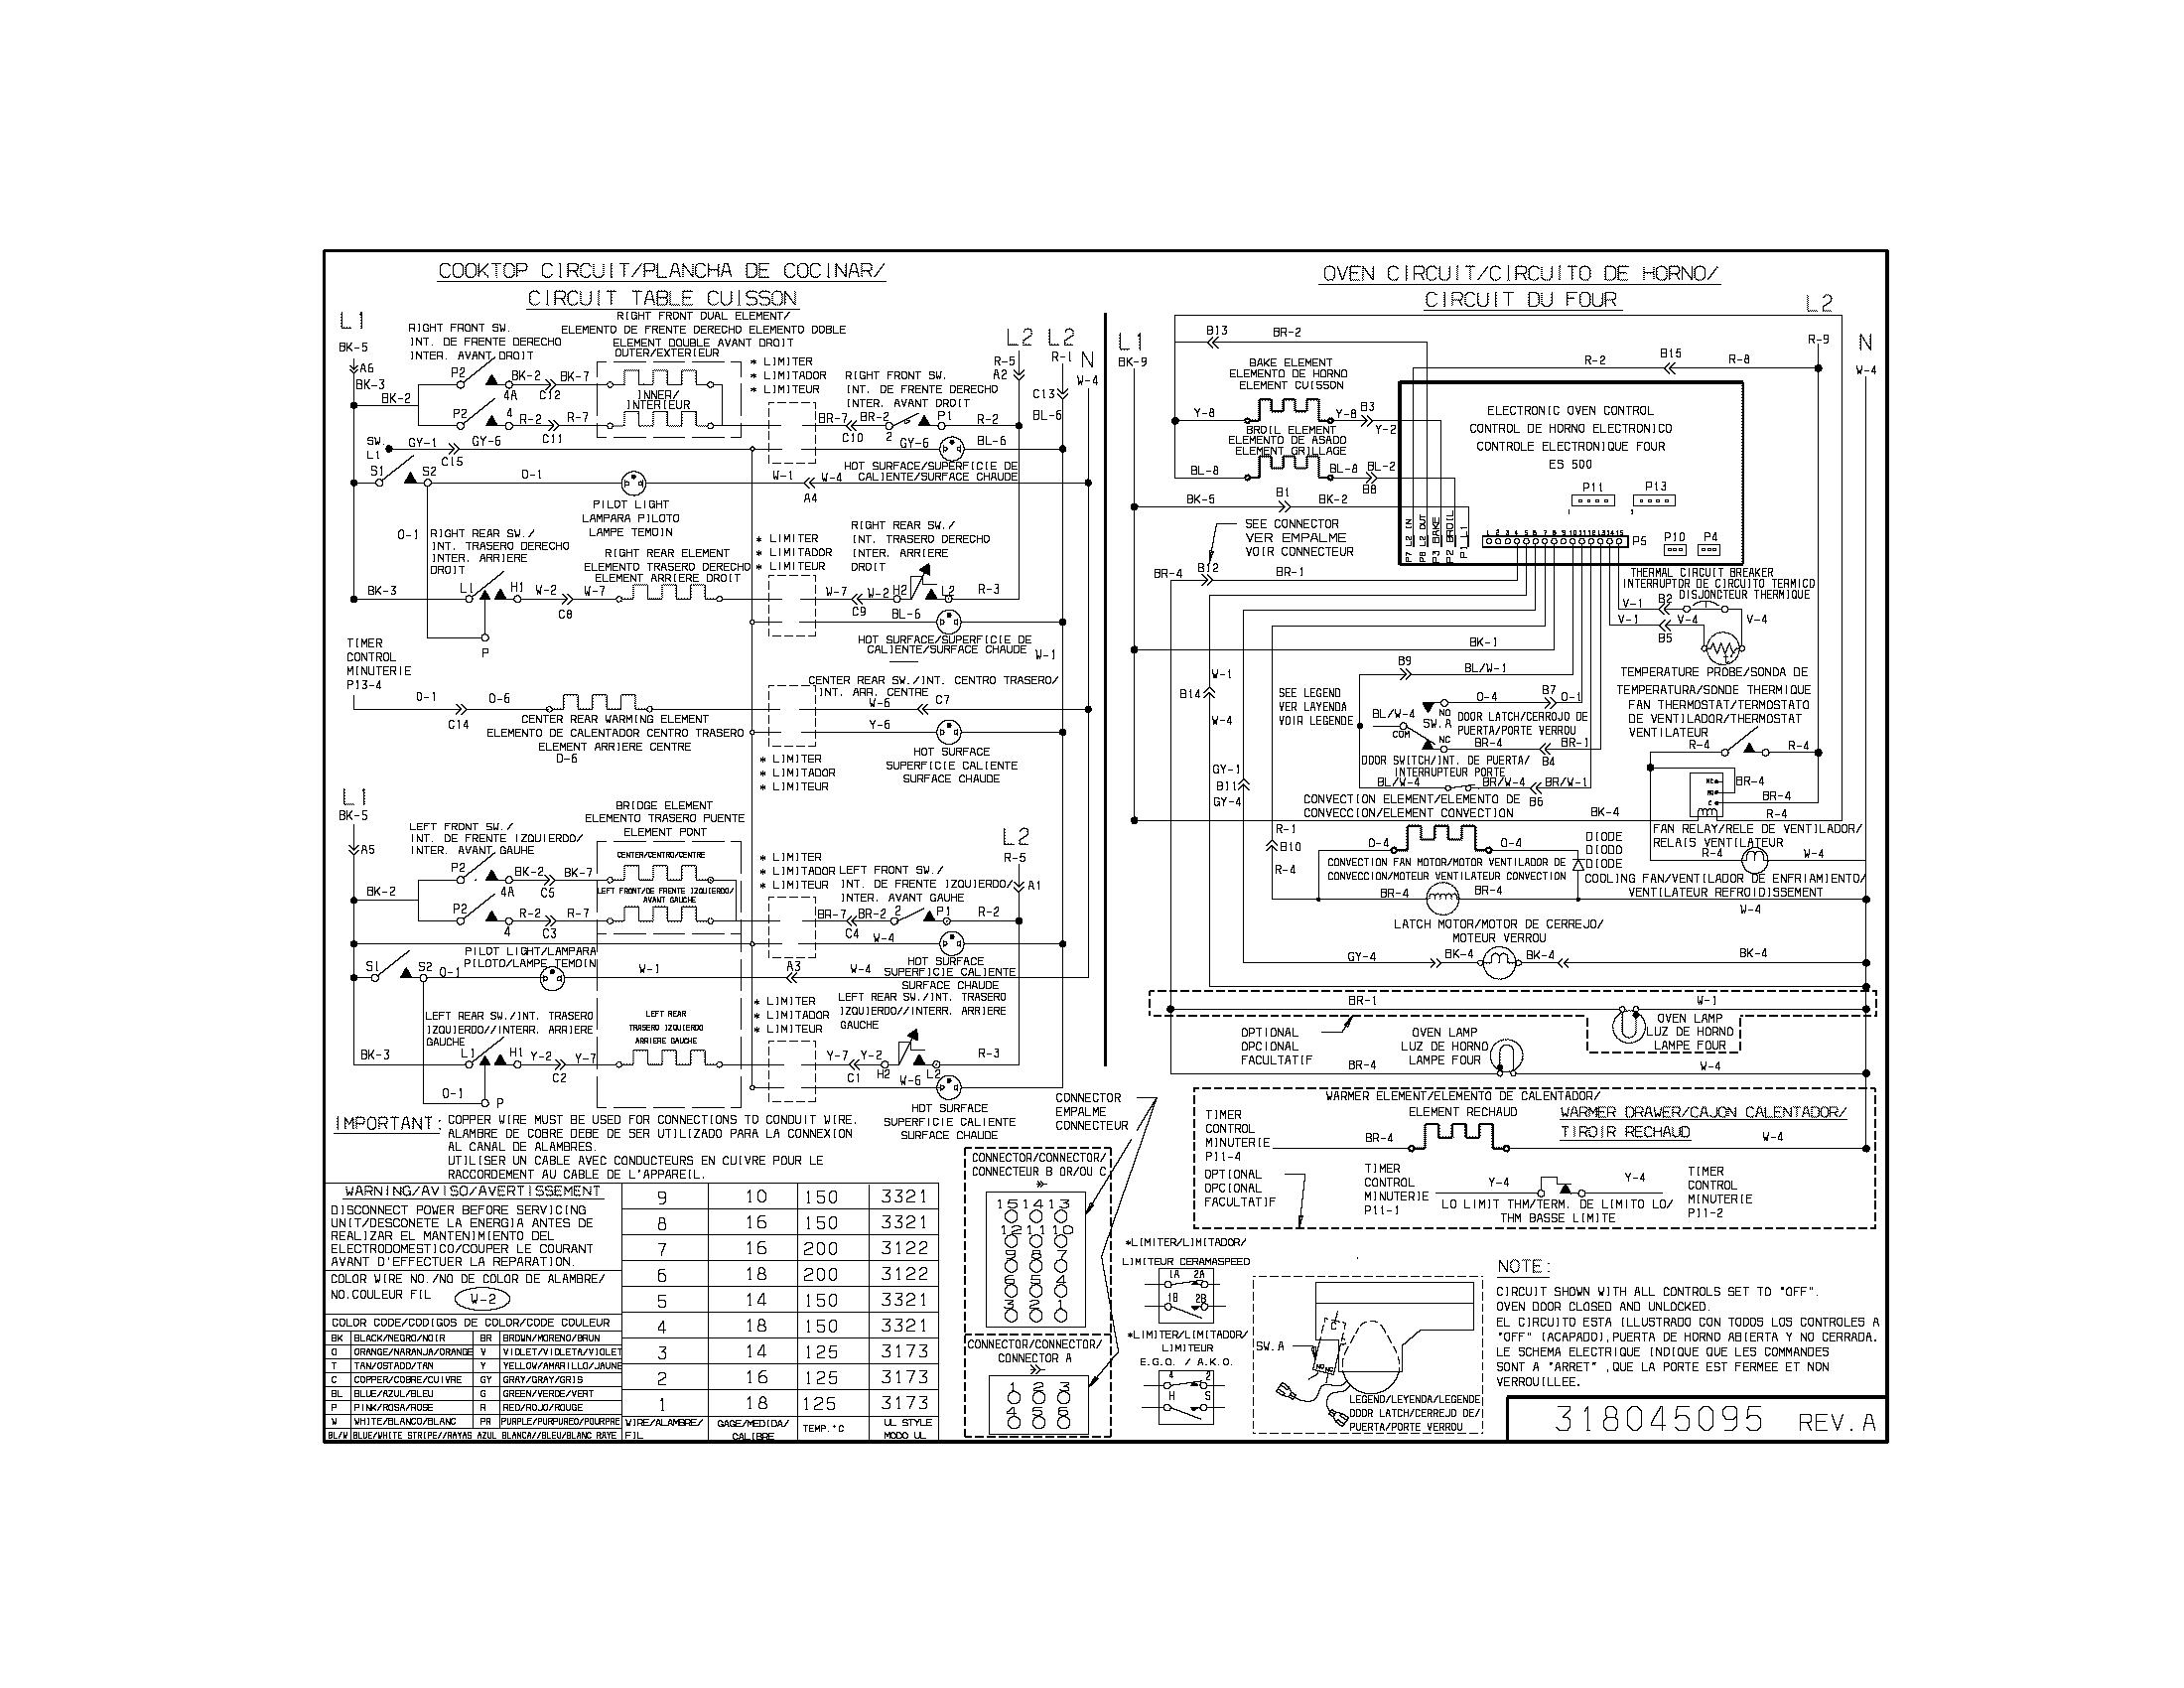 Jenn Air Wiring Schematic | Wiring Liry Kelvinator Wall Oven Wiring Diagram on